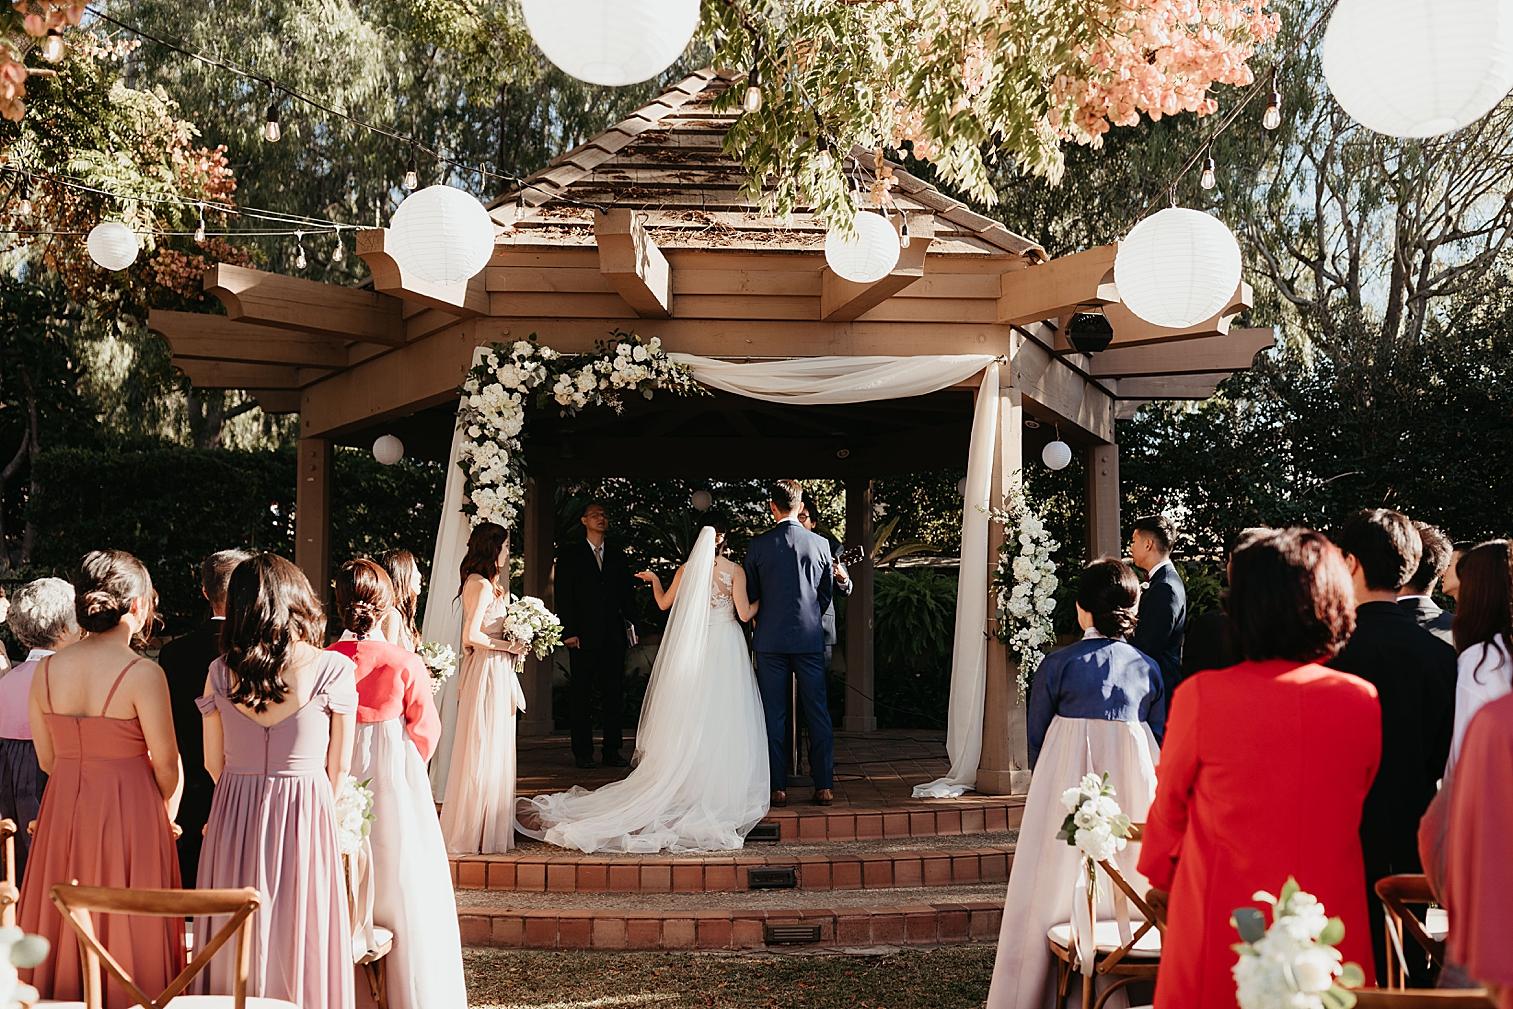 Secret-Garden-Rancho-Santa-Fe-Wedding-62.jpg